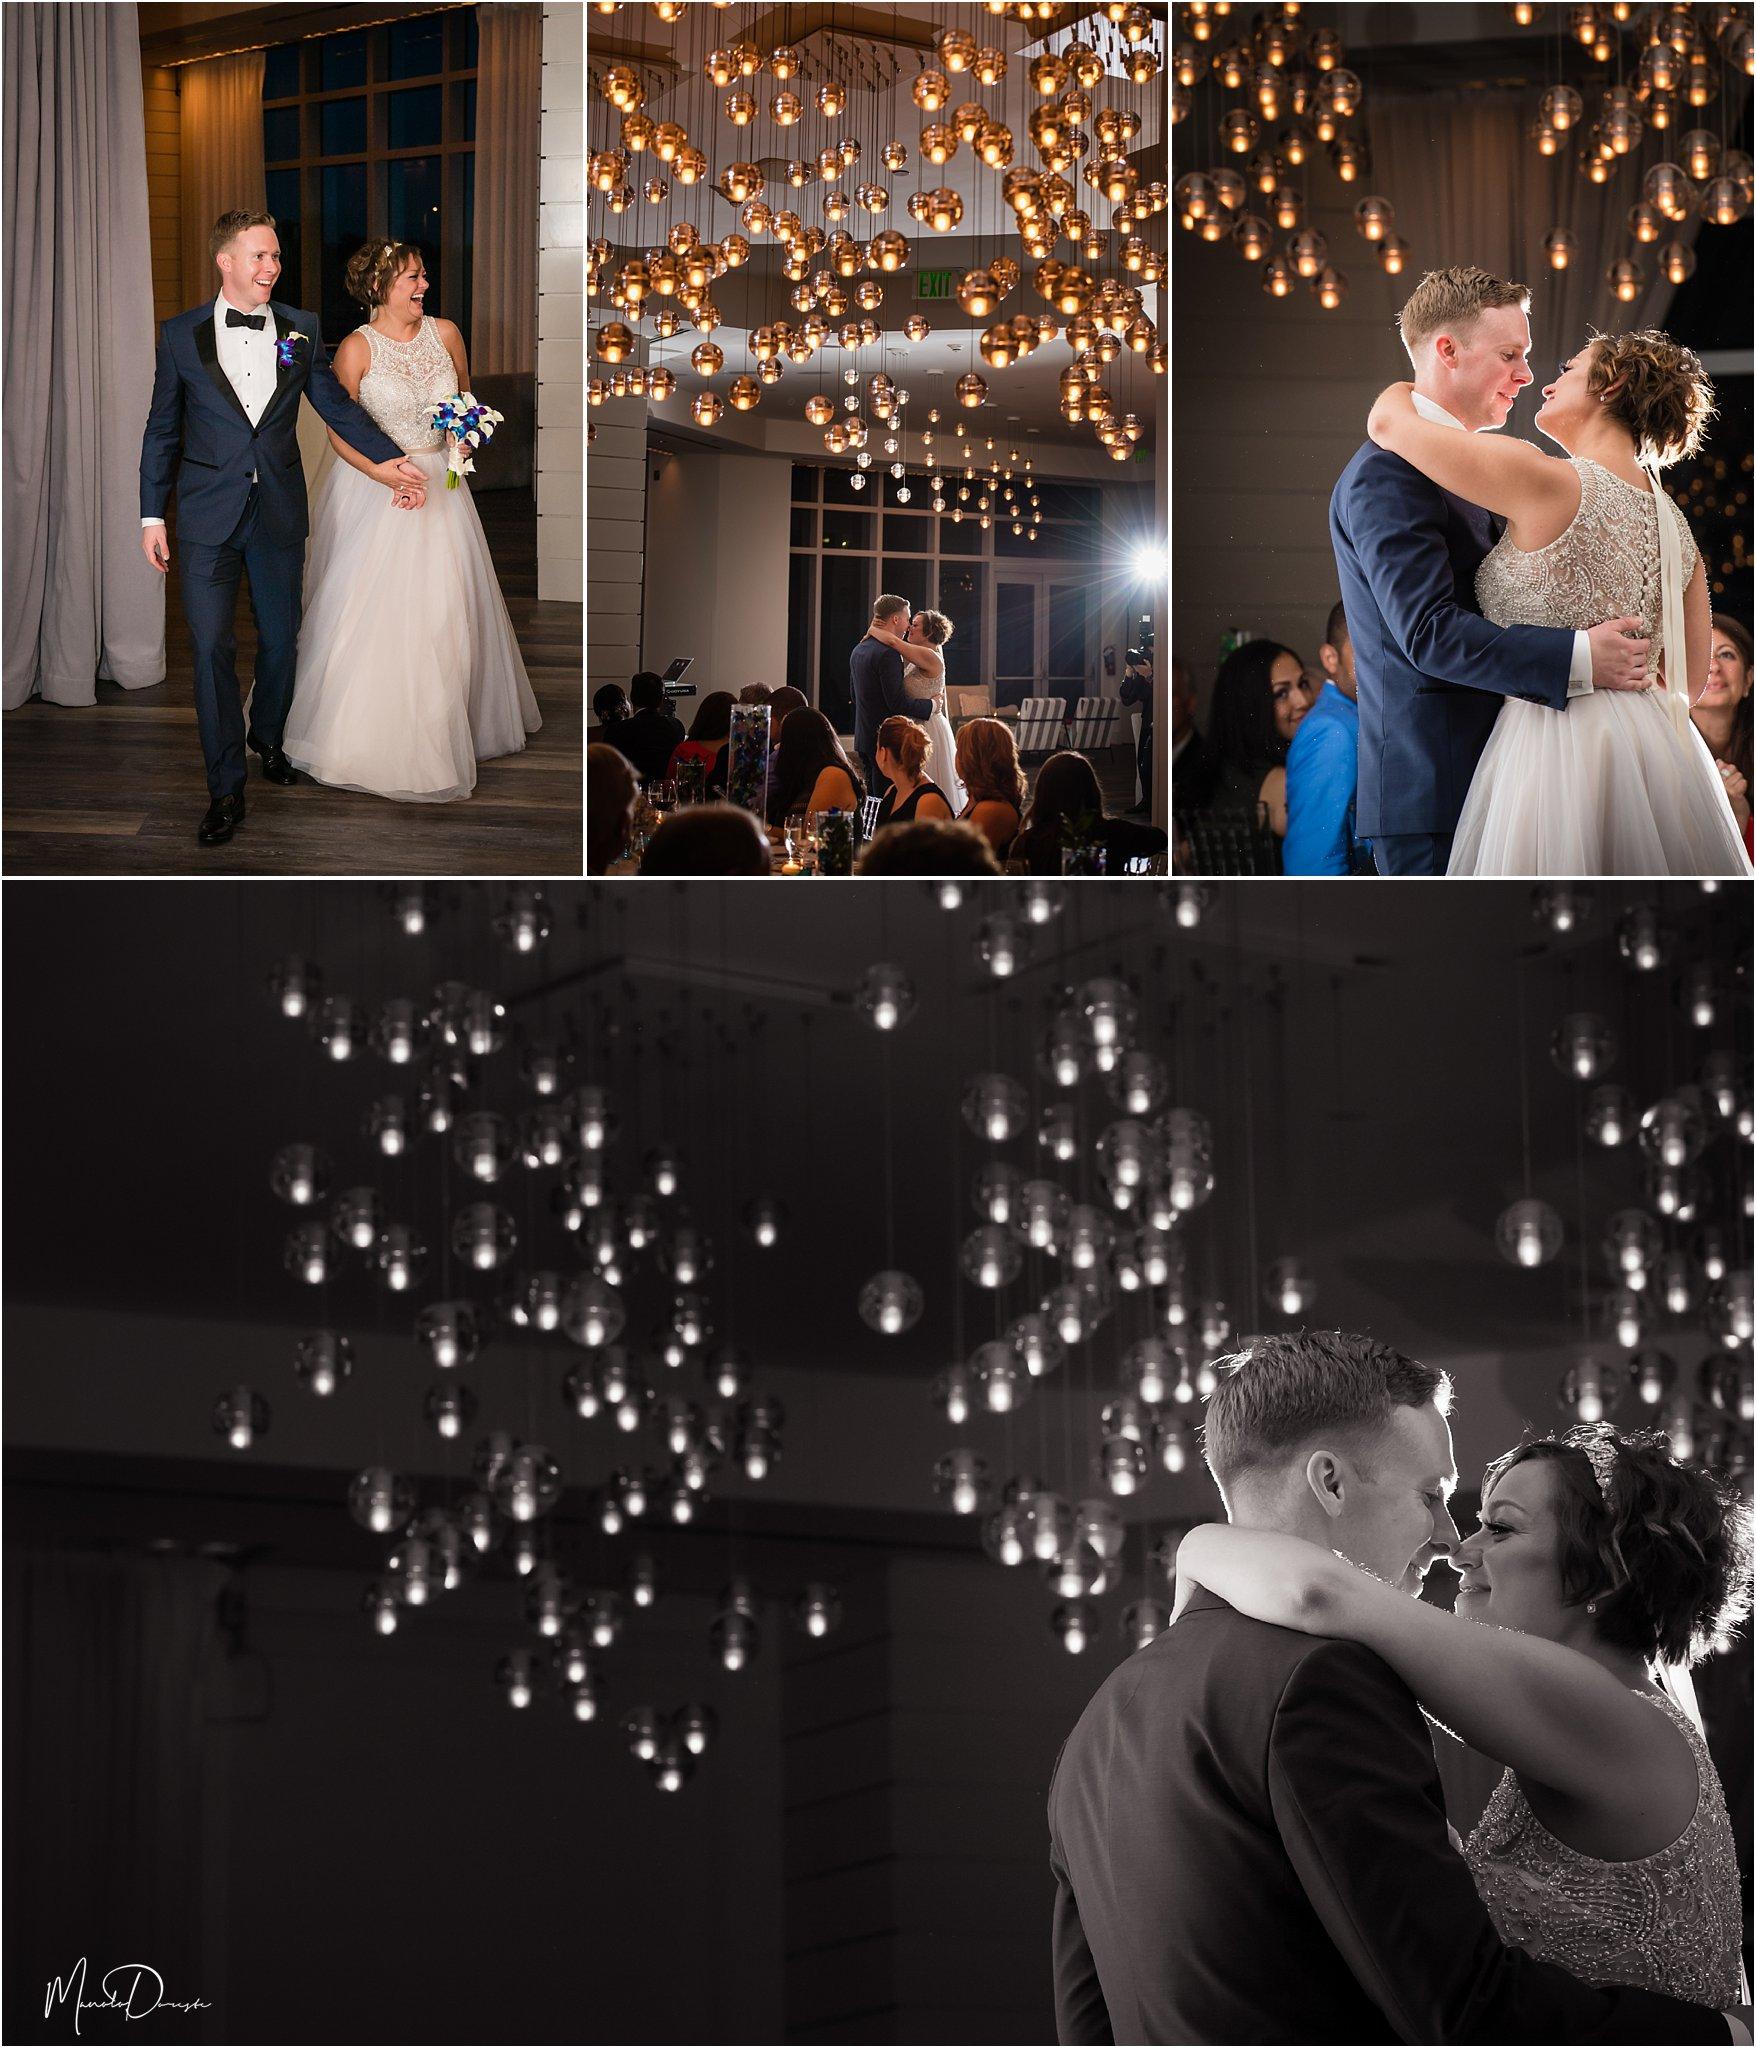 0457_ManoloDoreste_InFocusStudios_Wedding_Family_Photography_Miami_MiamiPhotographer.jpg